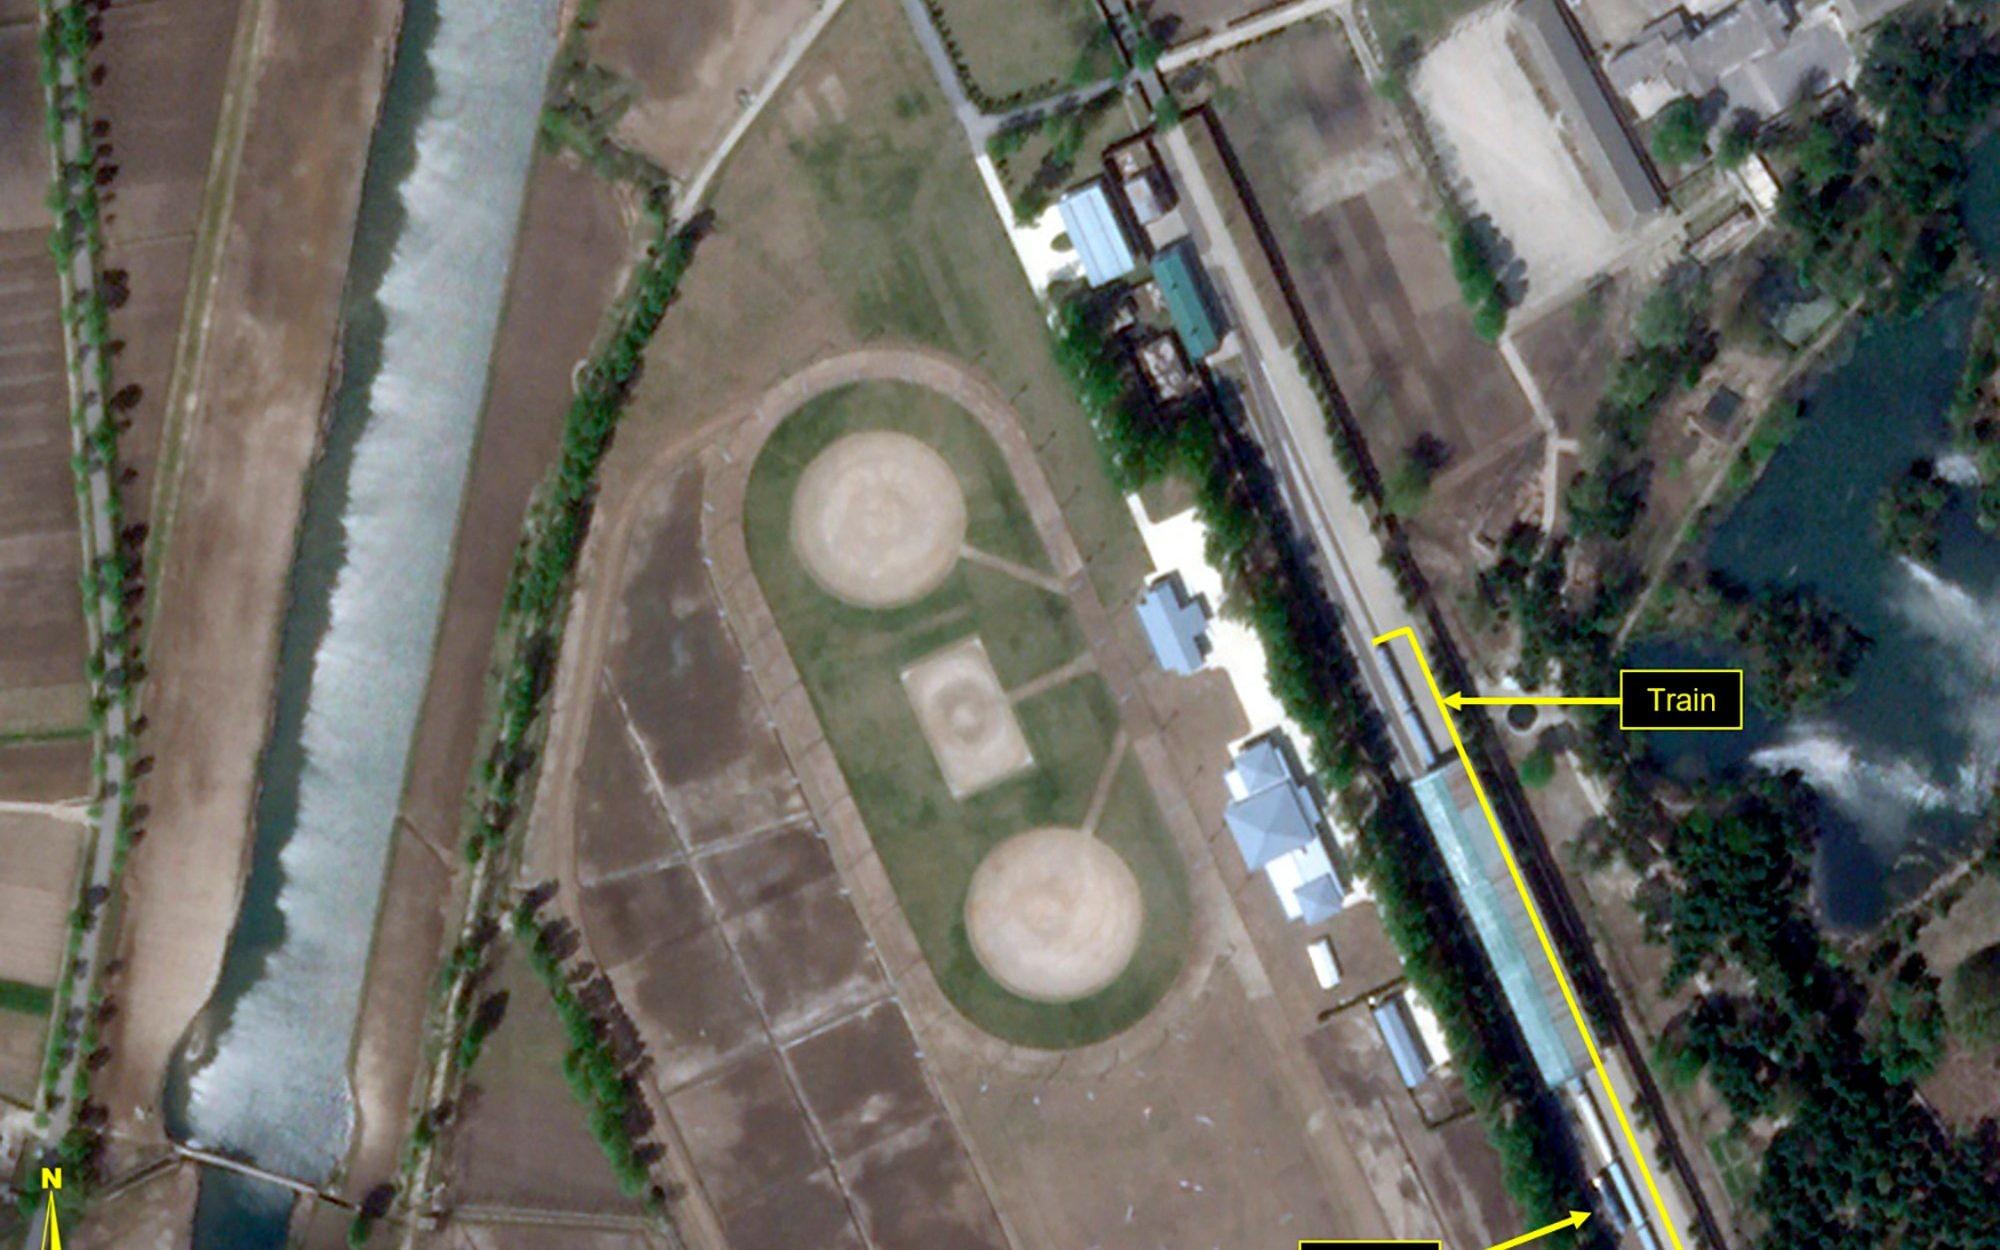 Kim Jong-uns train spotted at North Korea coastal resort amid conflicting rumours over health